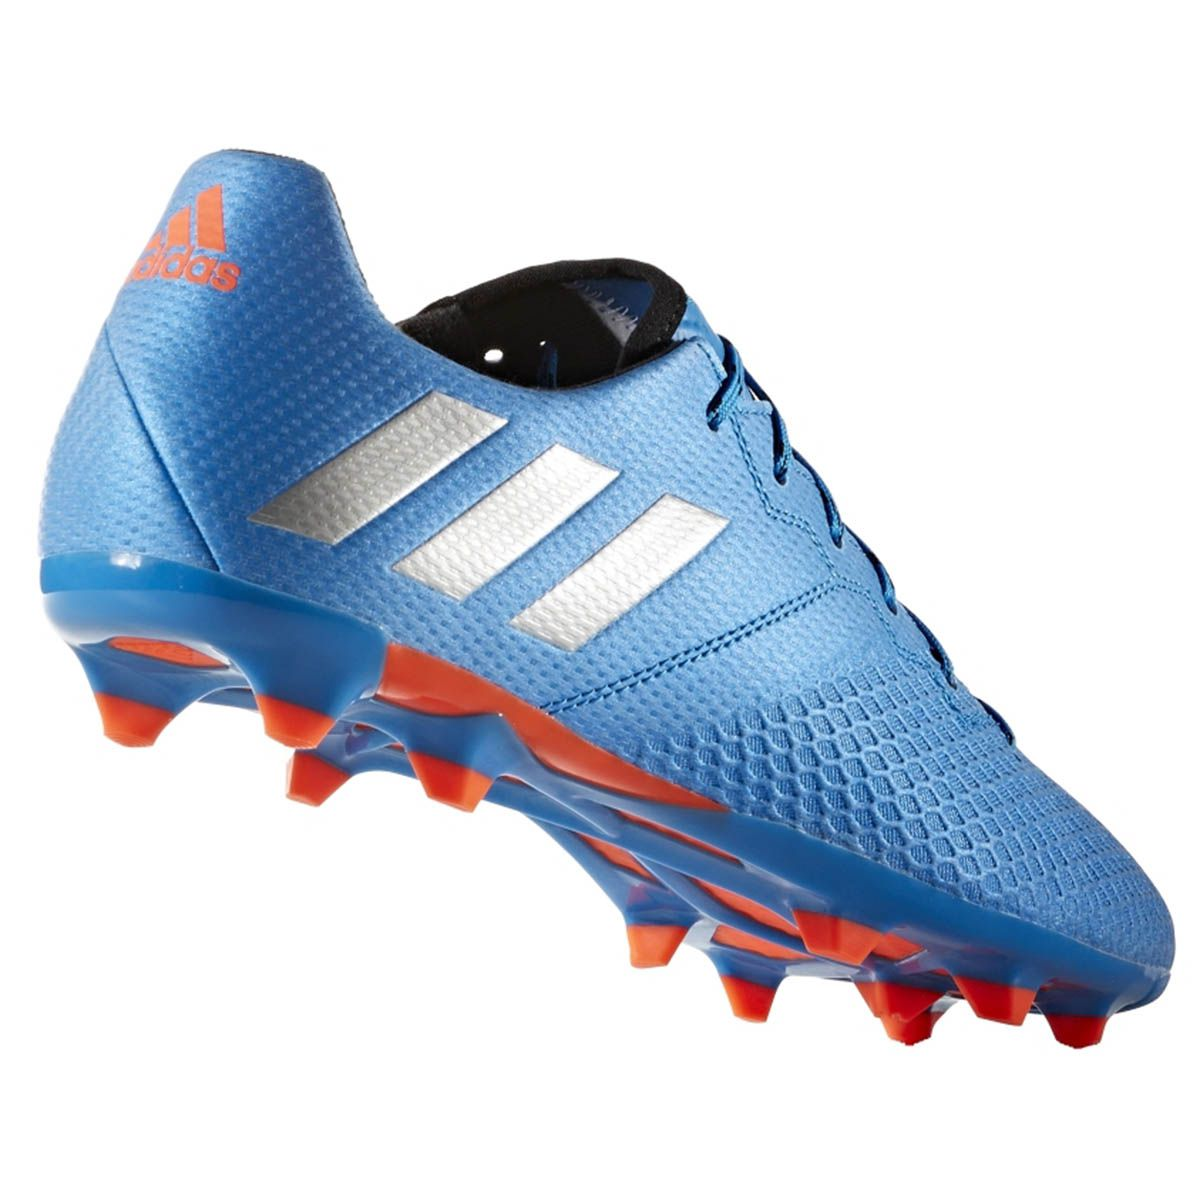 b254366c3f Chuteira Adidas Messi 16.3 FG - Stigli